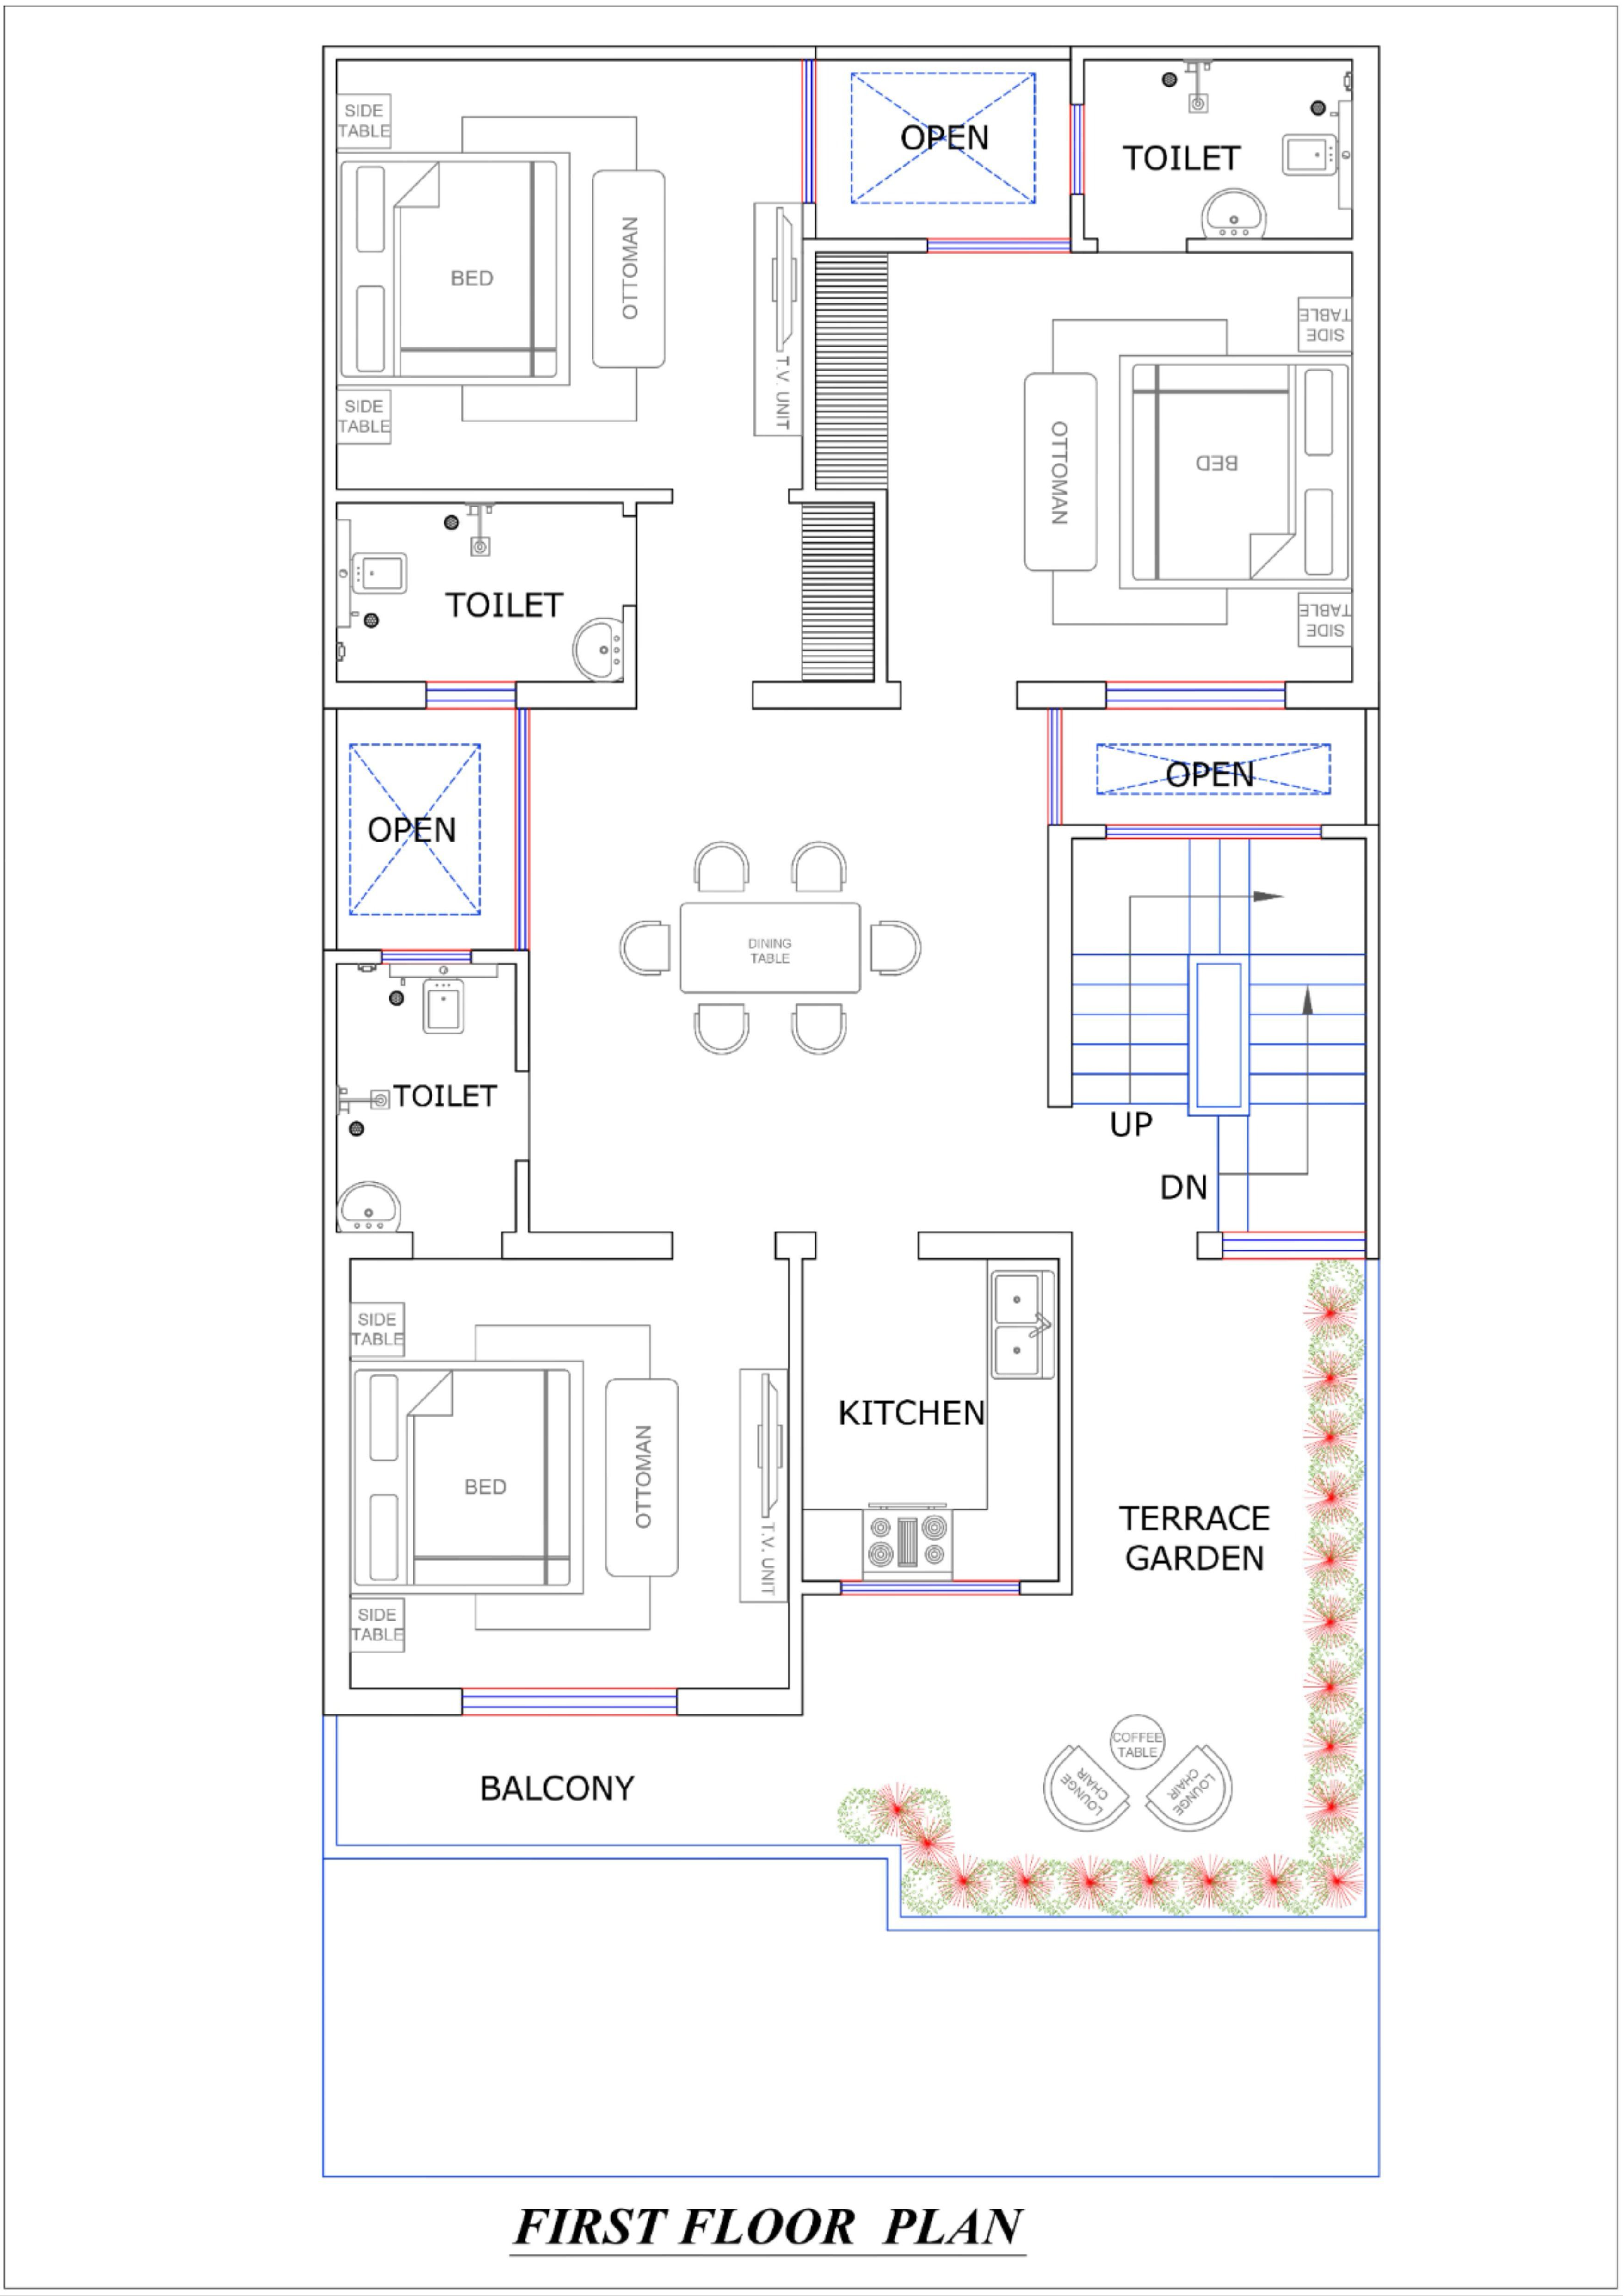 29x59 House Design Plan Home Design Plans Two Story House Design Family House Plans